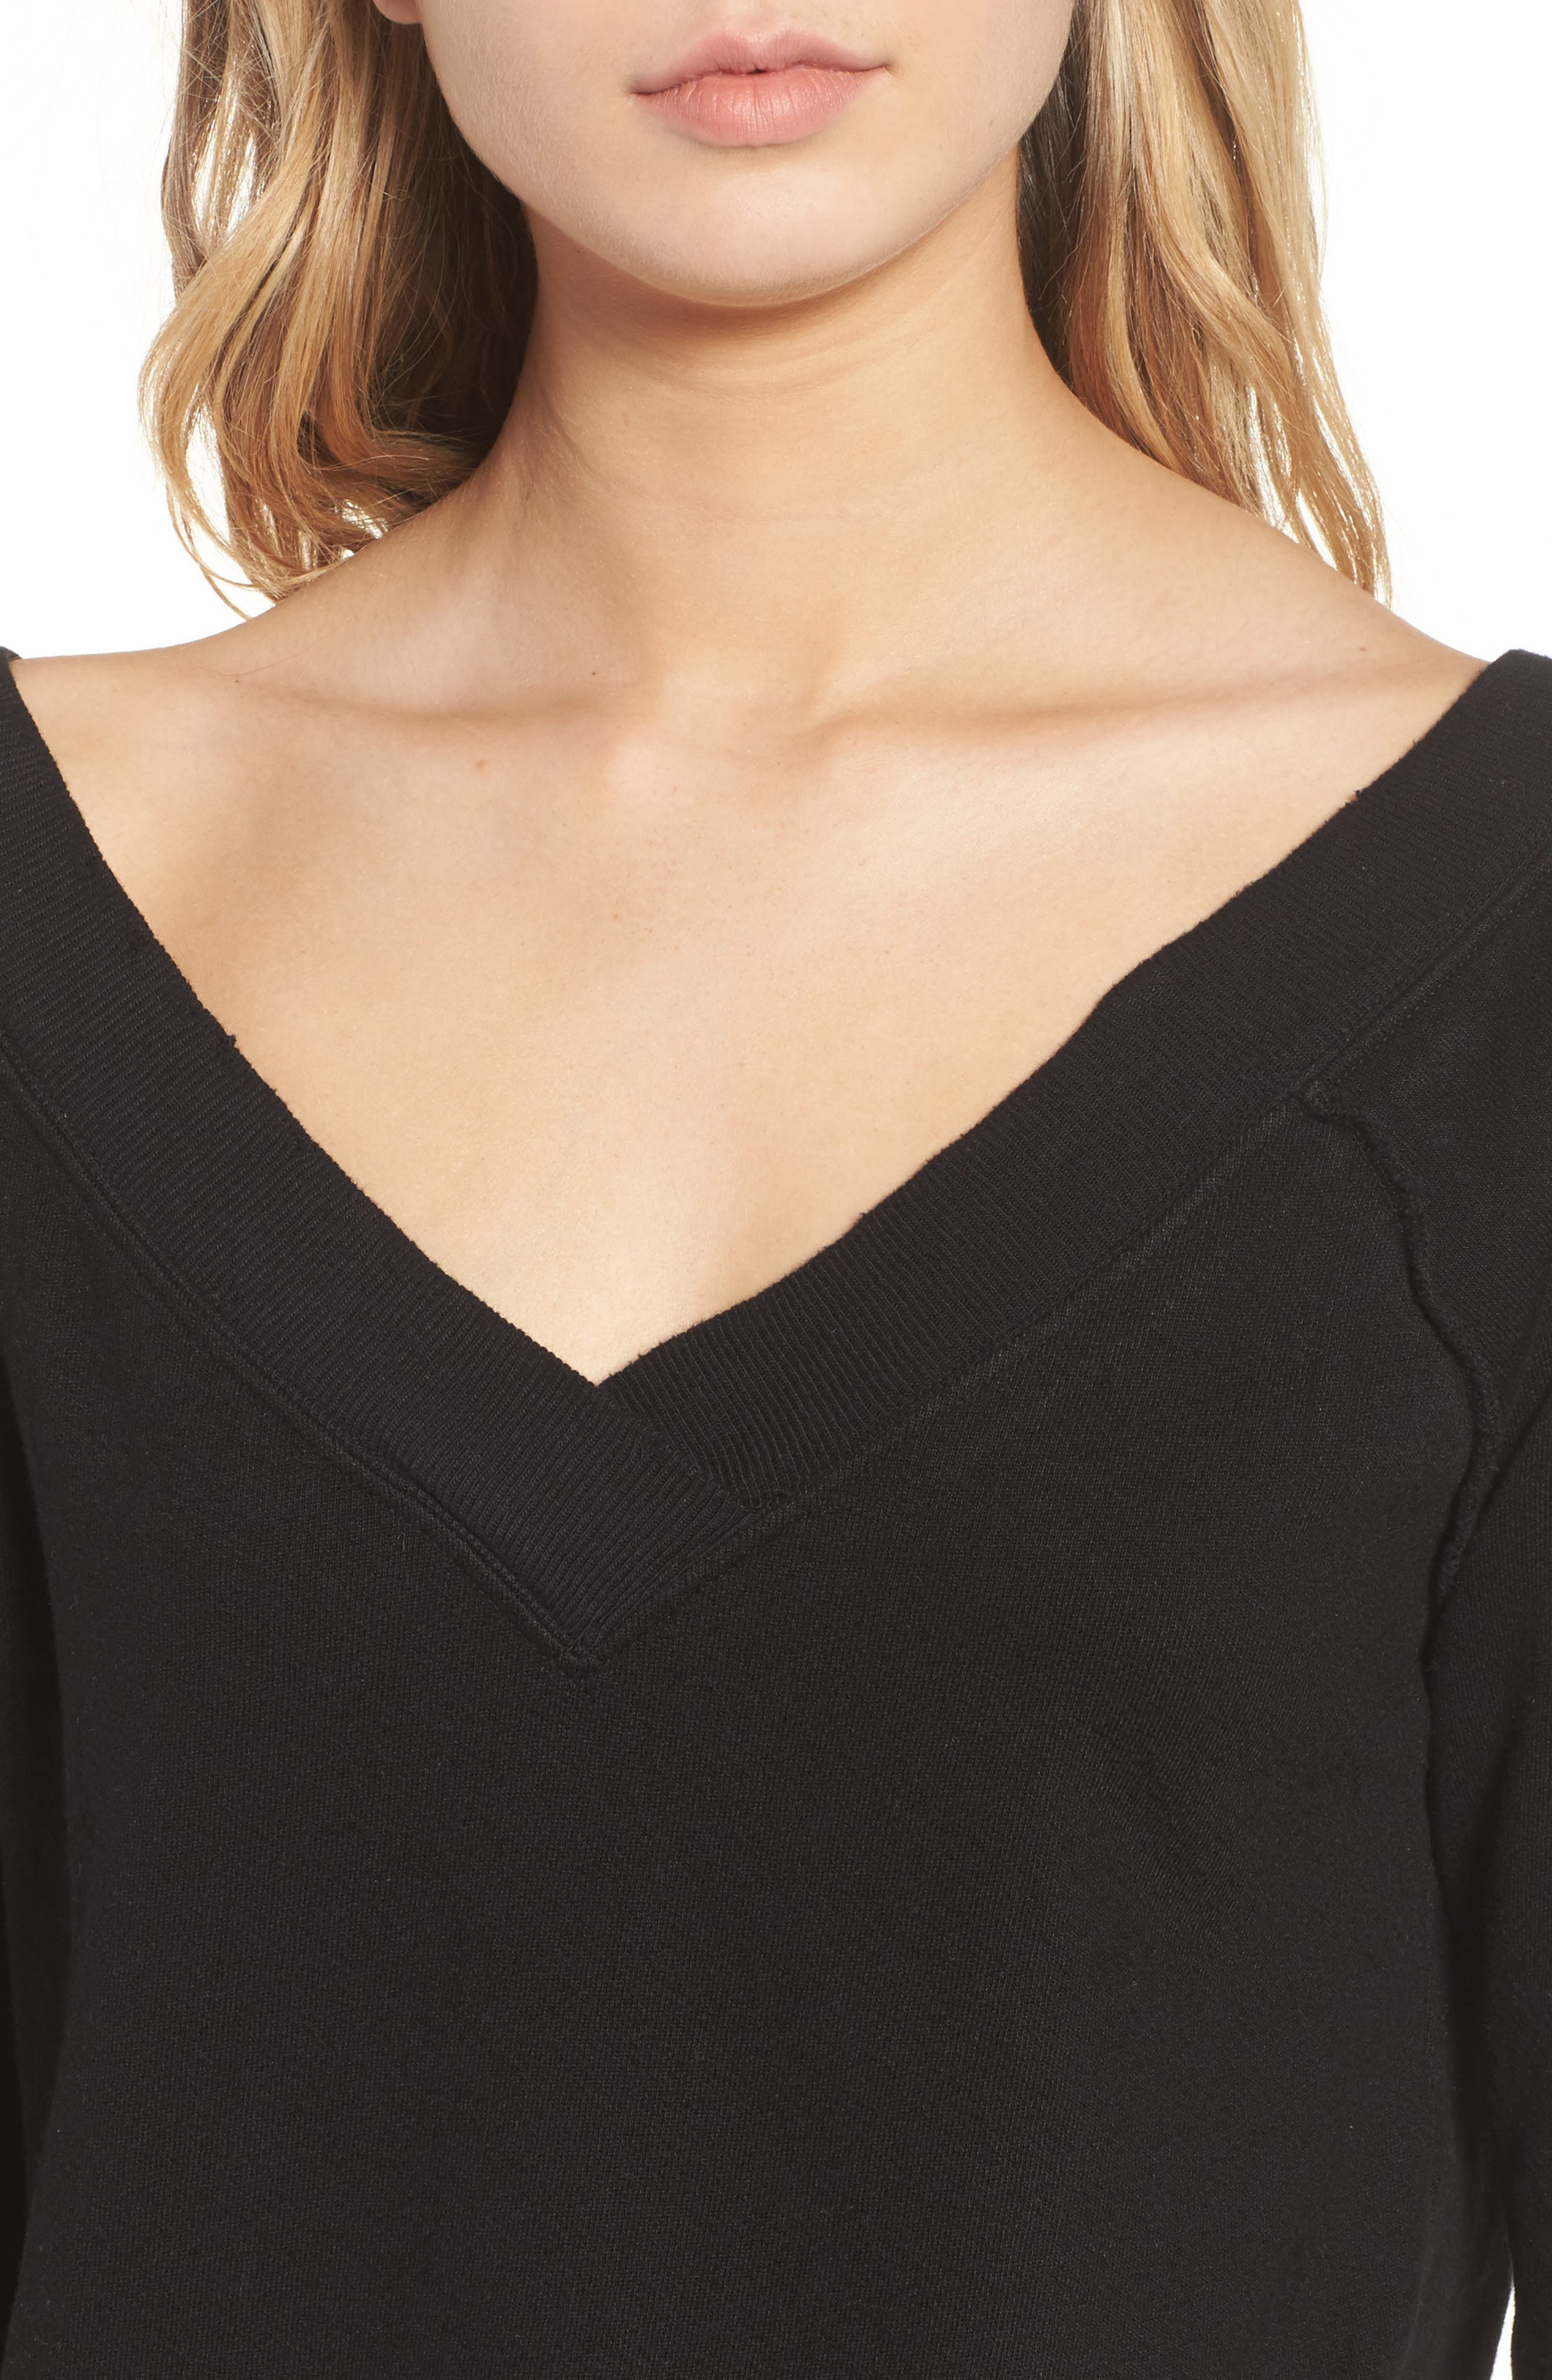 Mayer V-Neck Sweatshirt,                             Alternate thumbnail 4, color,                             002